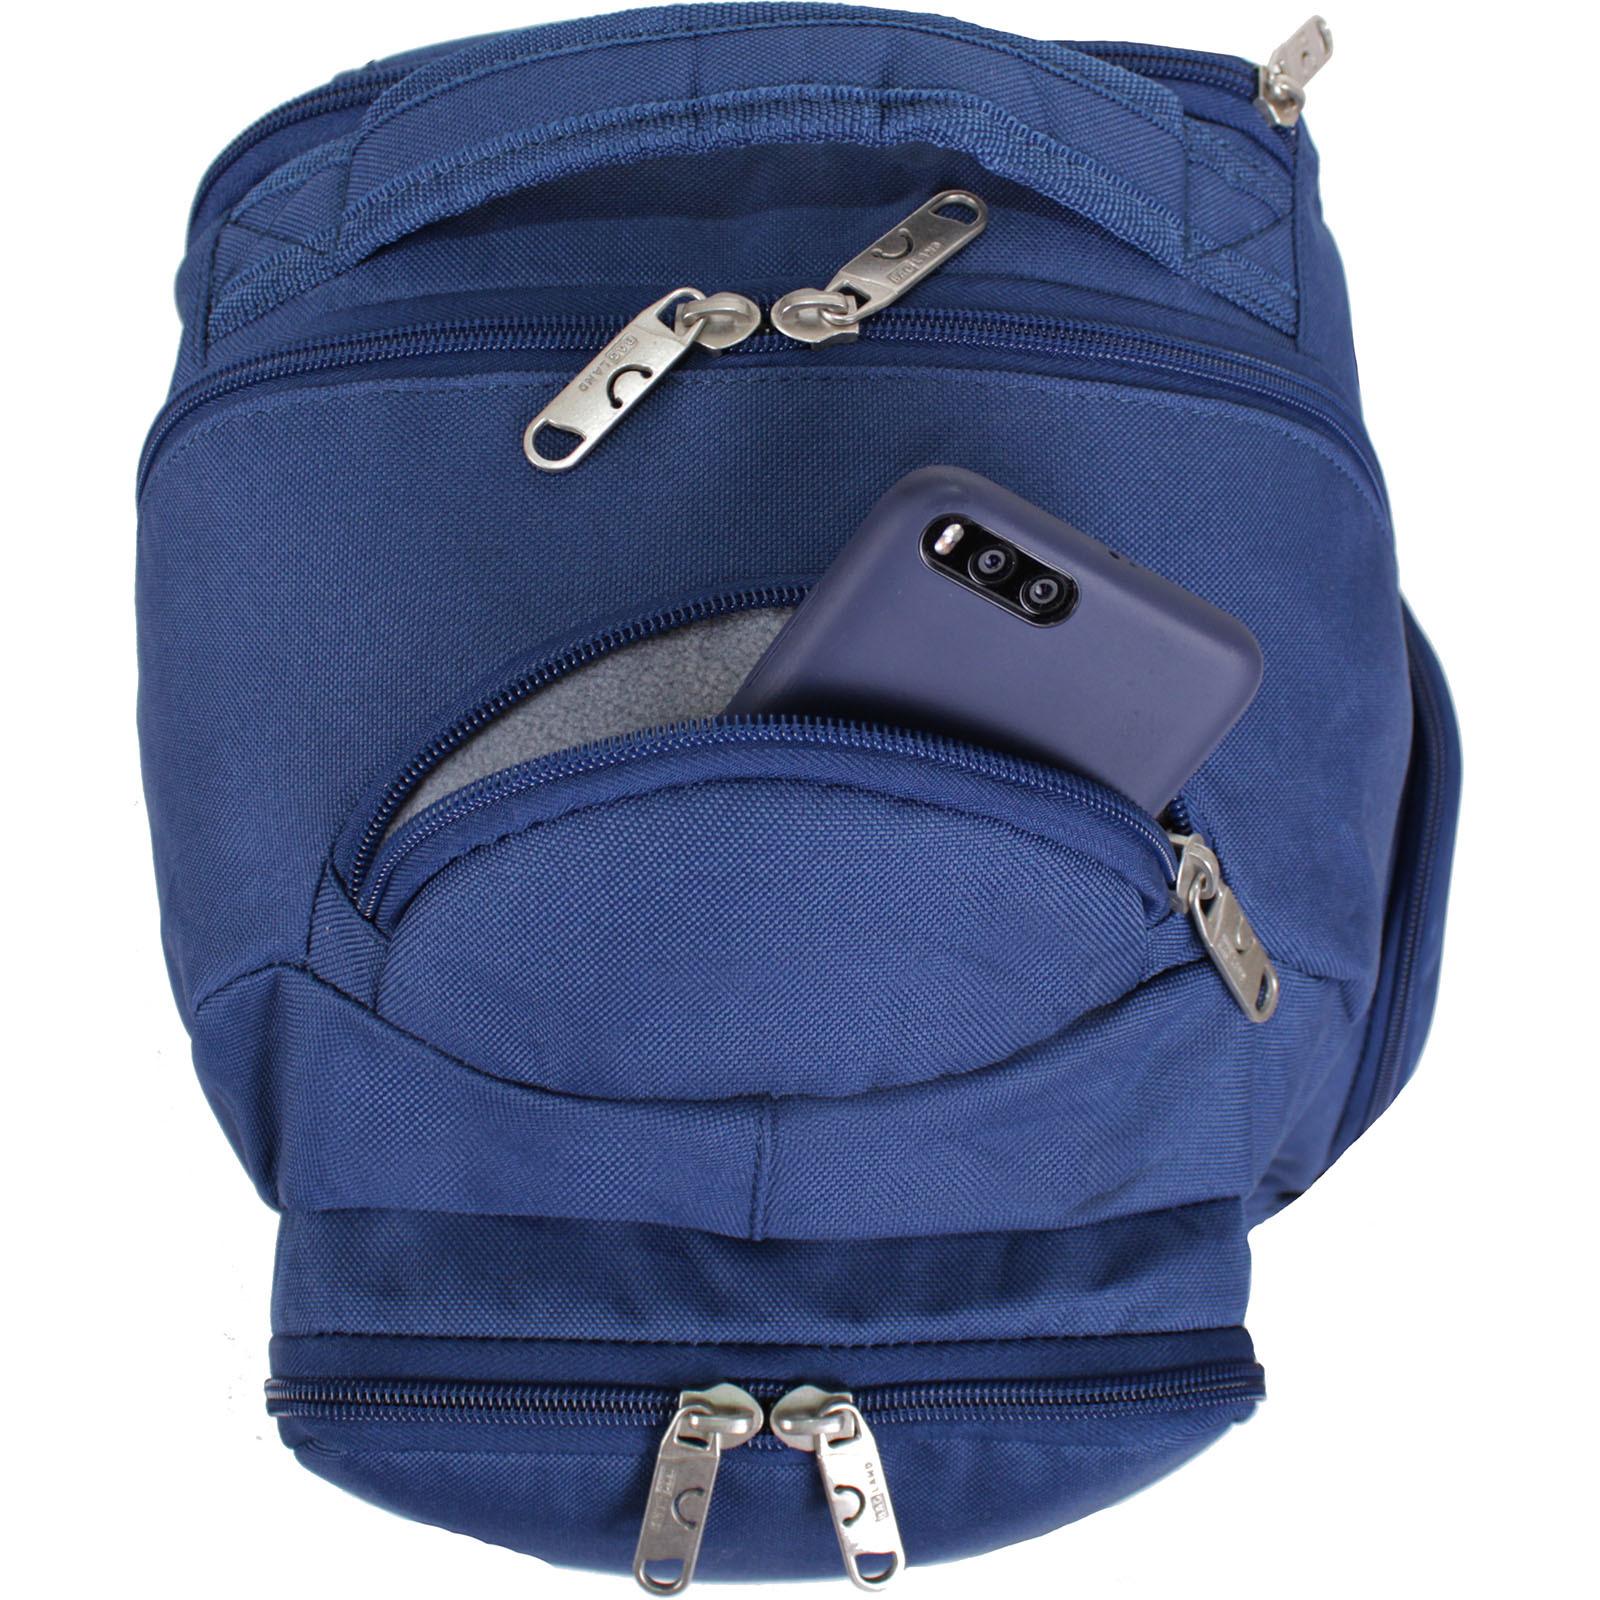 Рюкзак для ноутбука Bagland Техас 29 л. Синий (00532662)